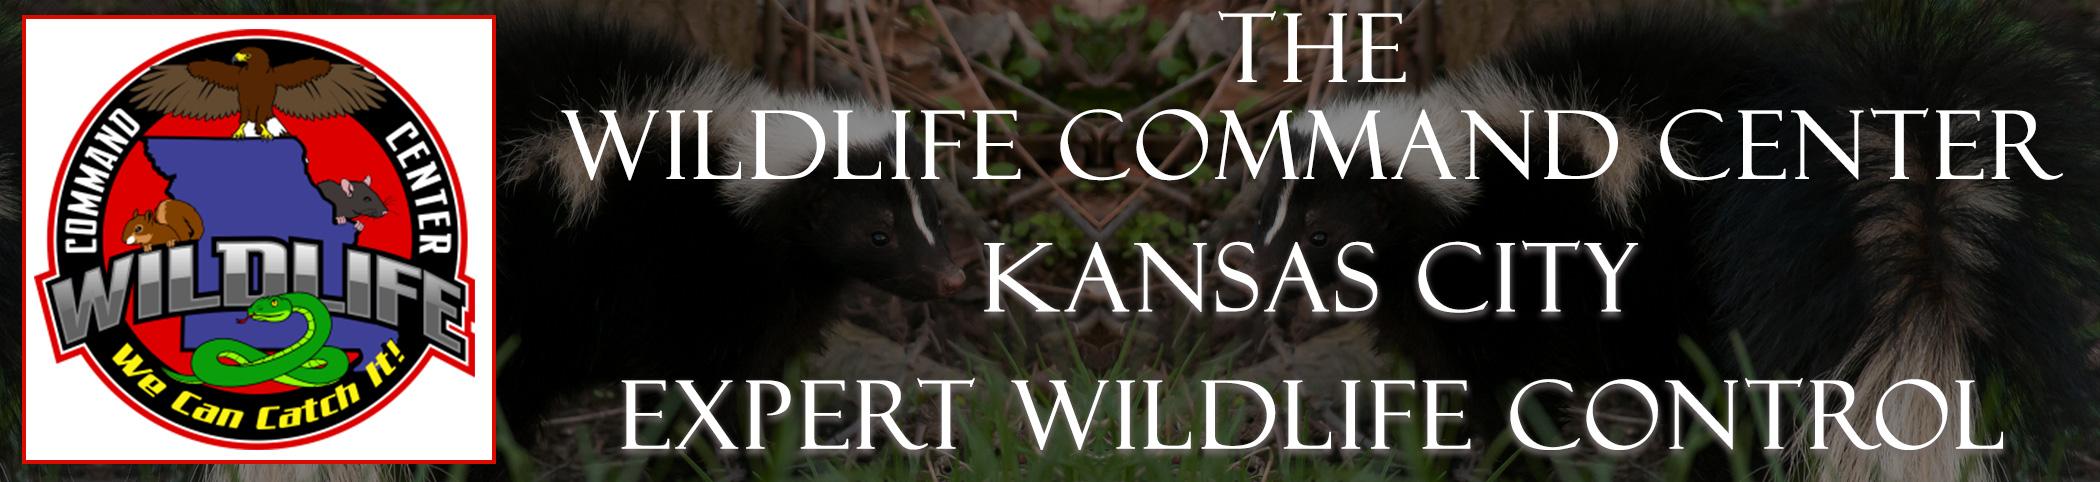 The Wildlife Command Center Kansas City Missouri Image